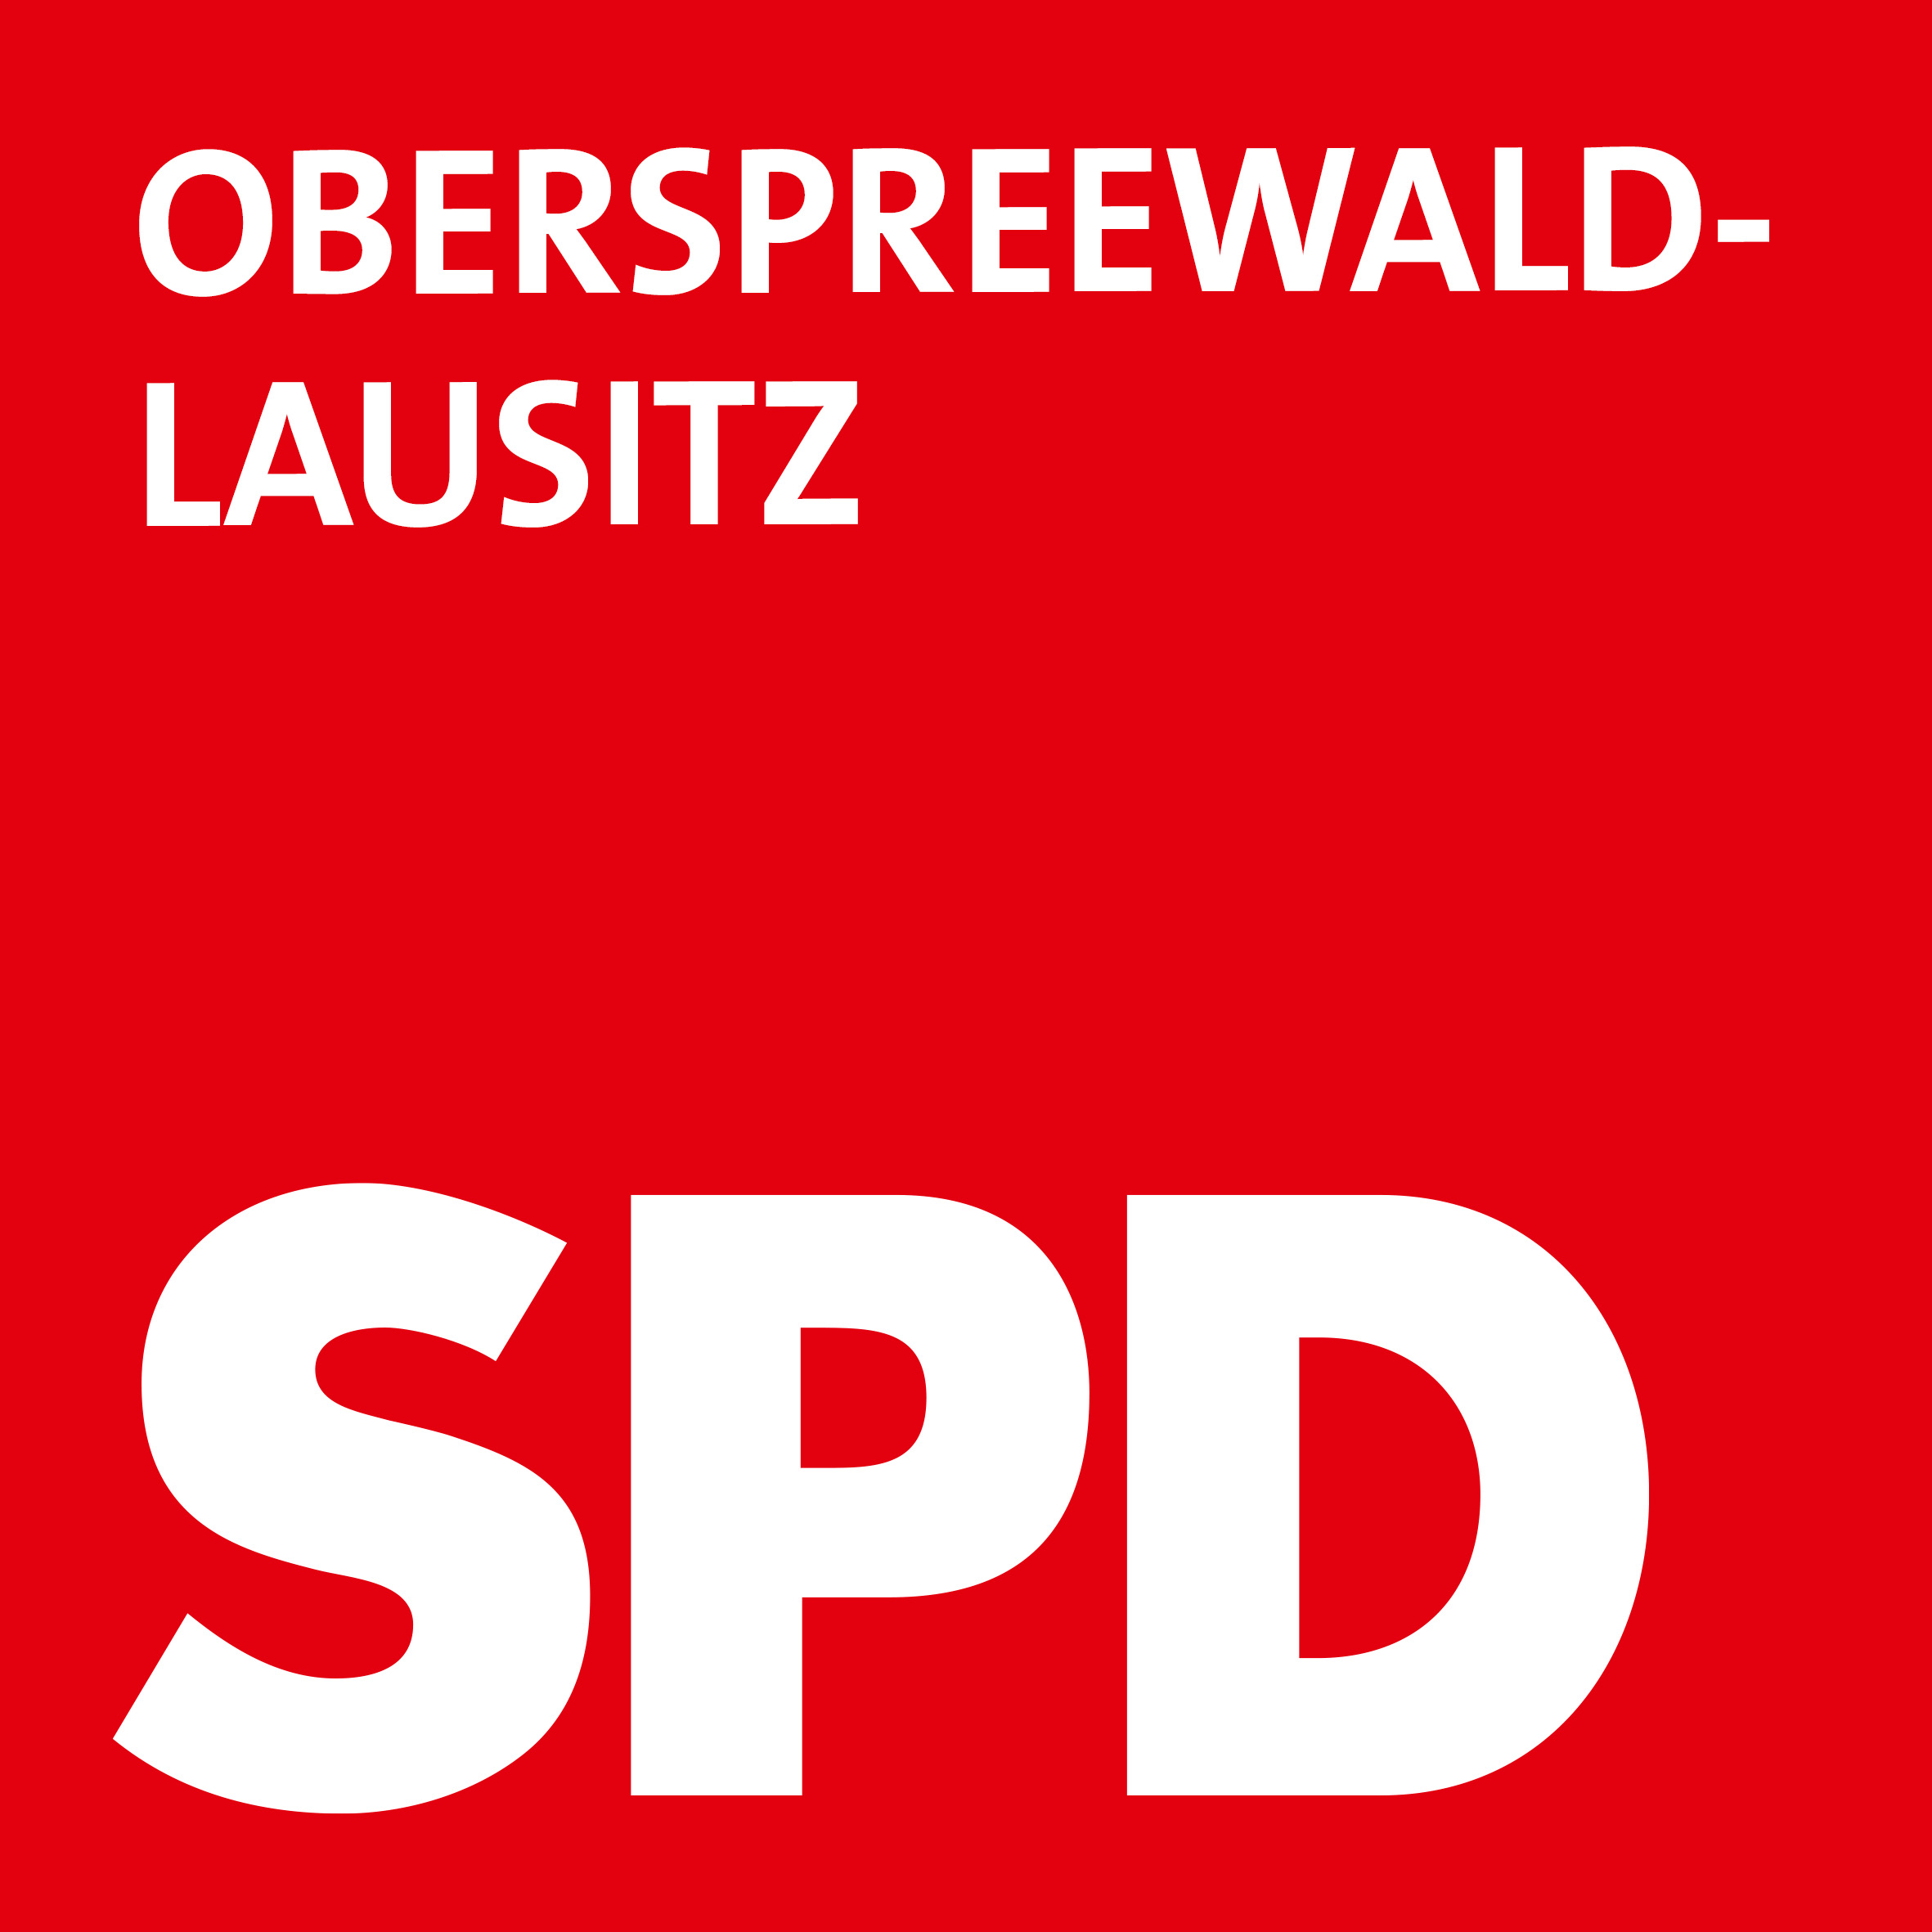 SPD Oberspreewald-Lausitz